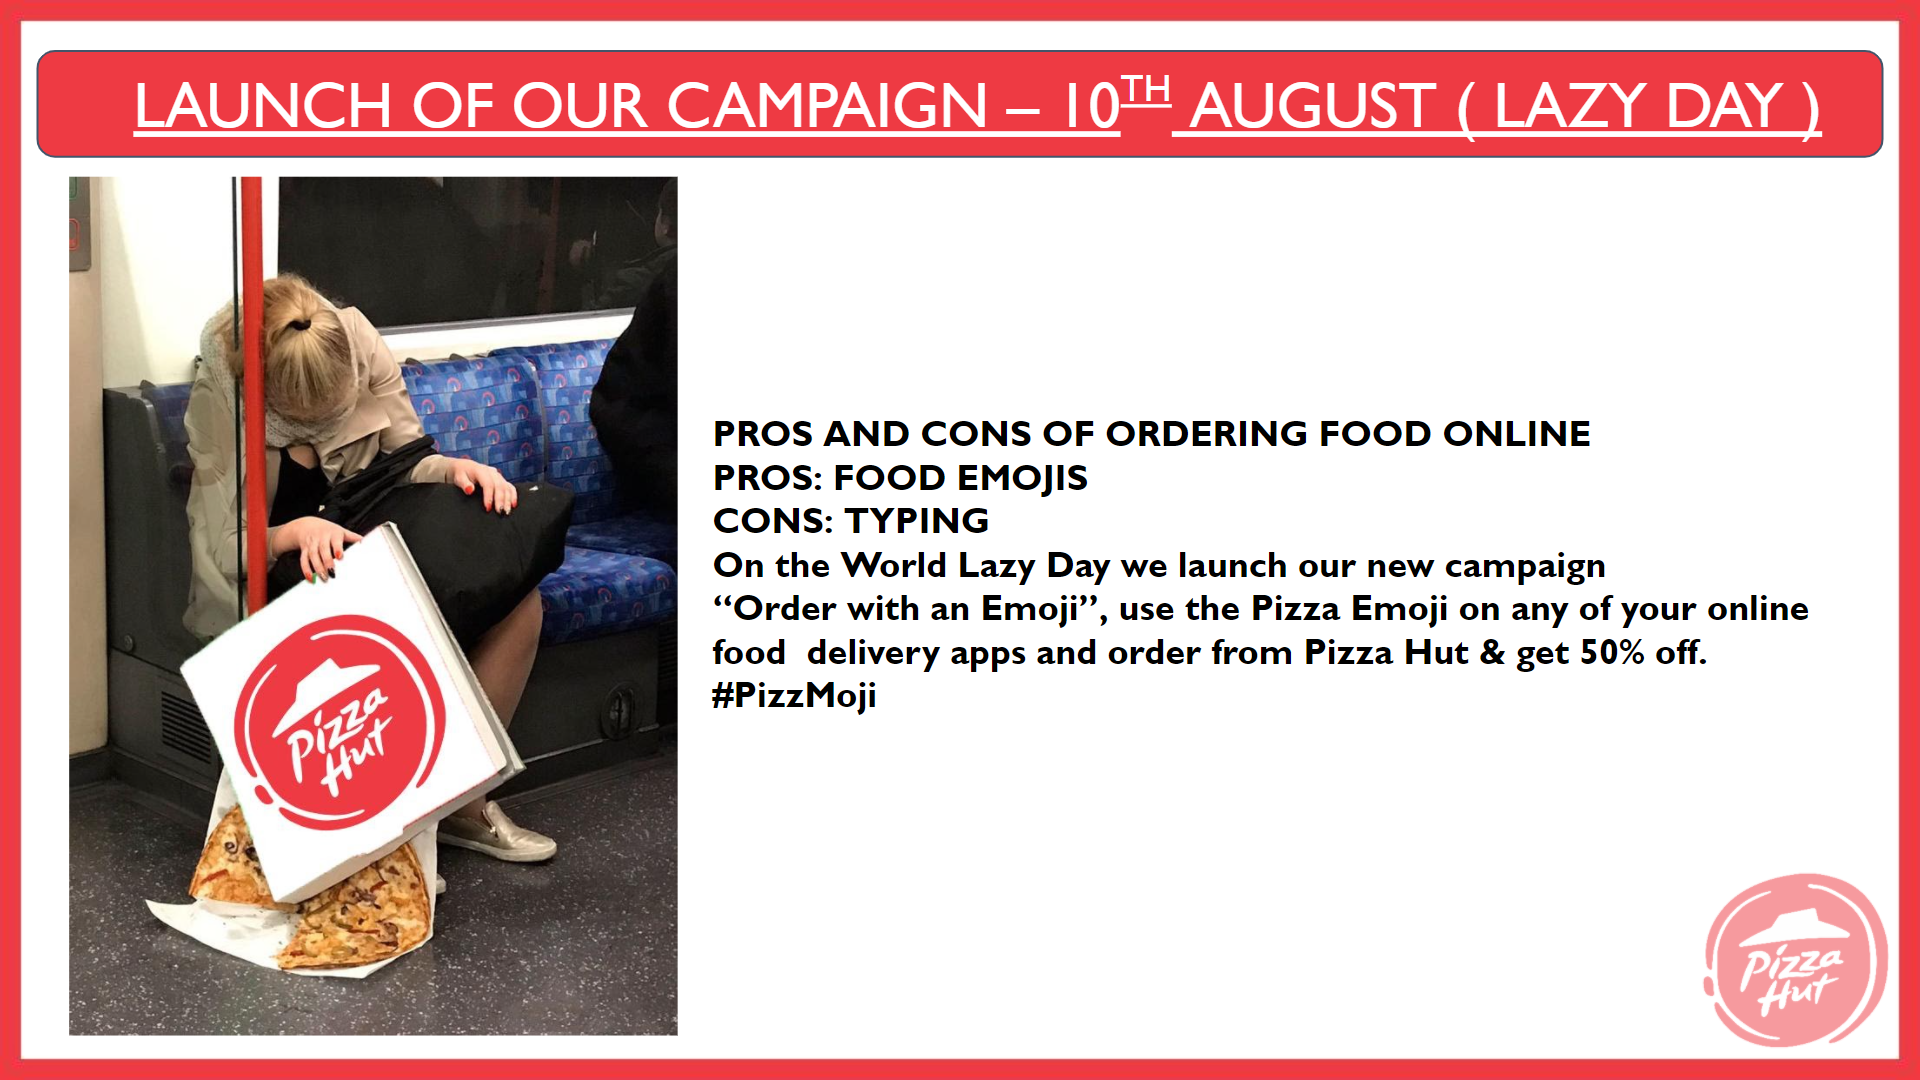 pizza hut marketing strategy Paid Post 1 - Pizza Hut Marketing and Advertising Strategy